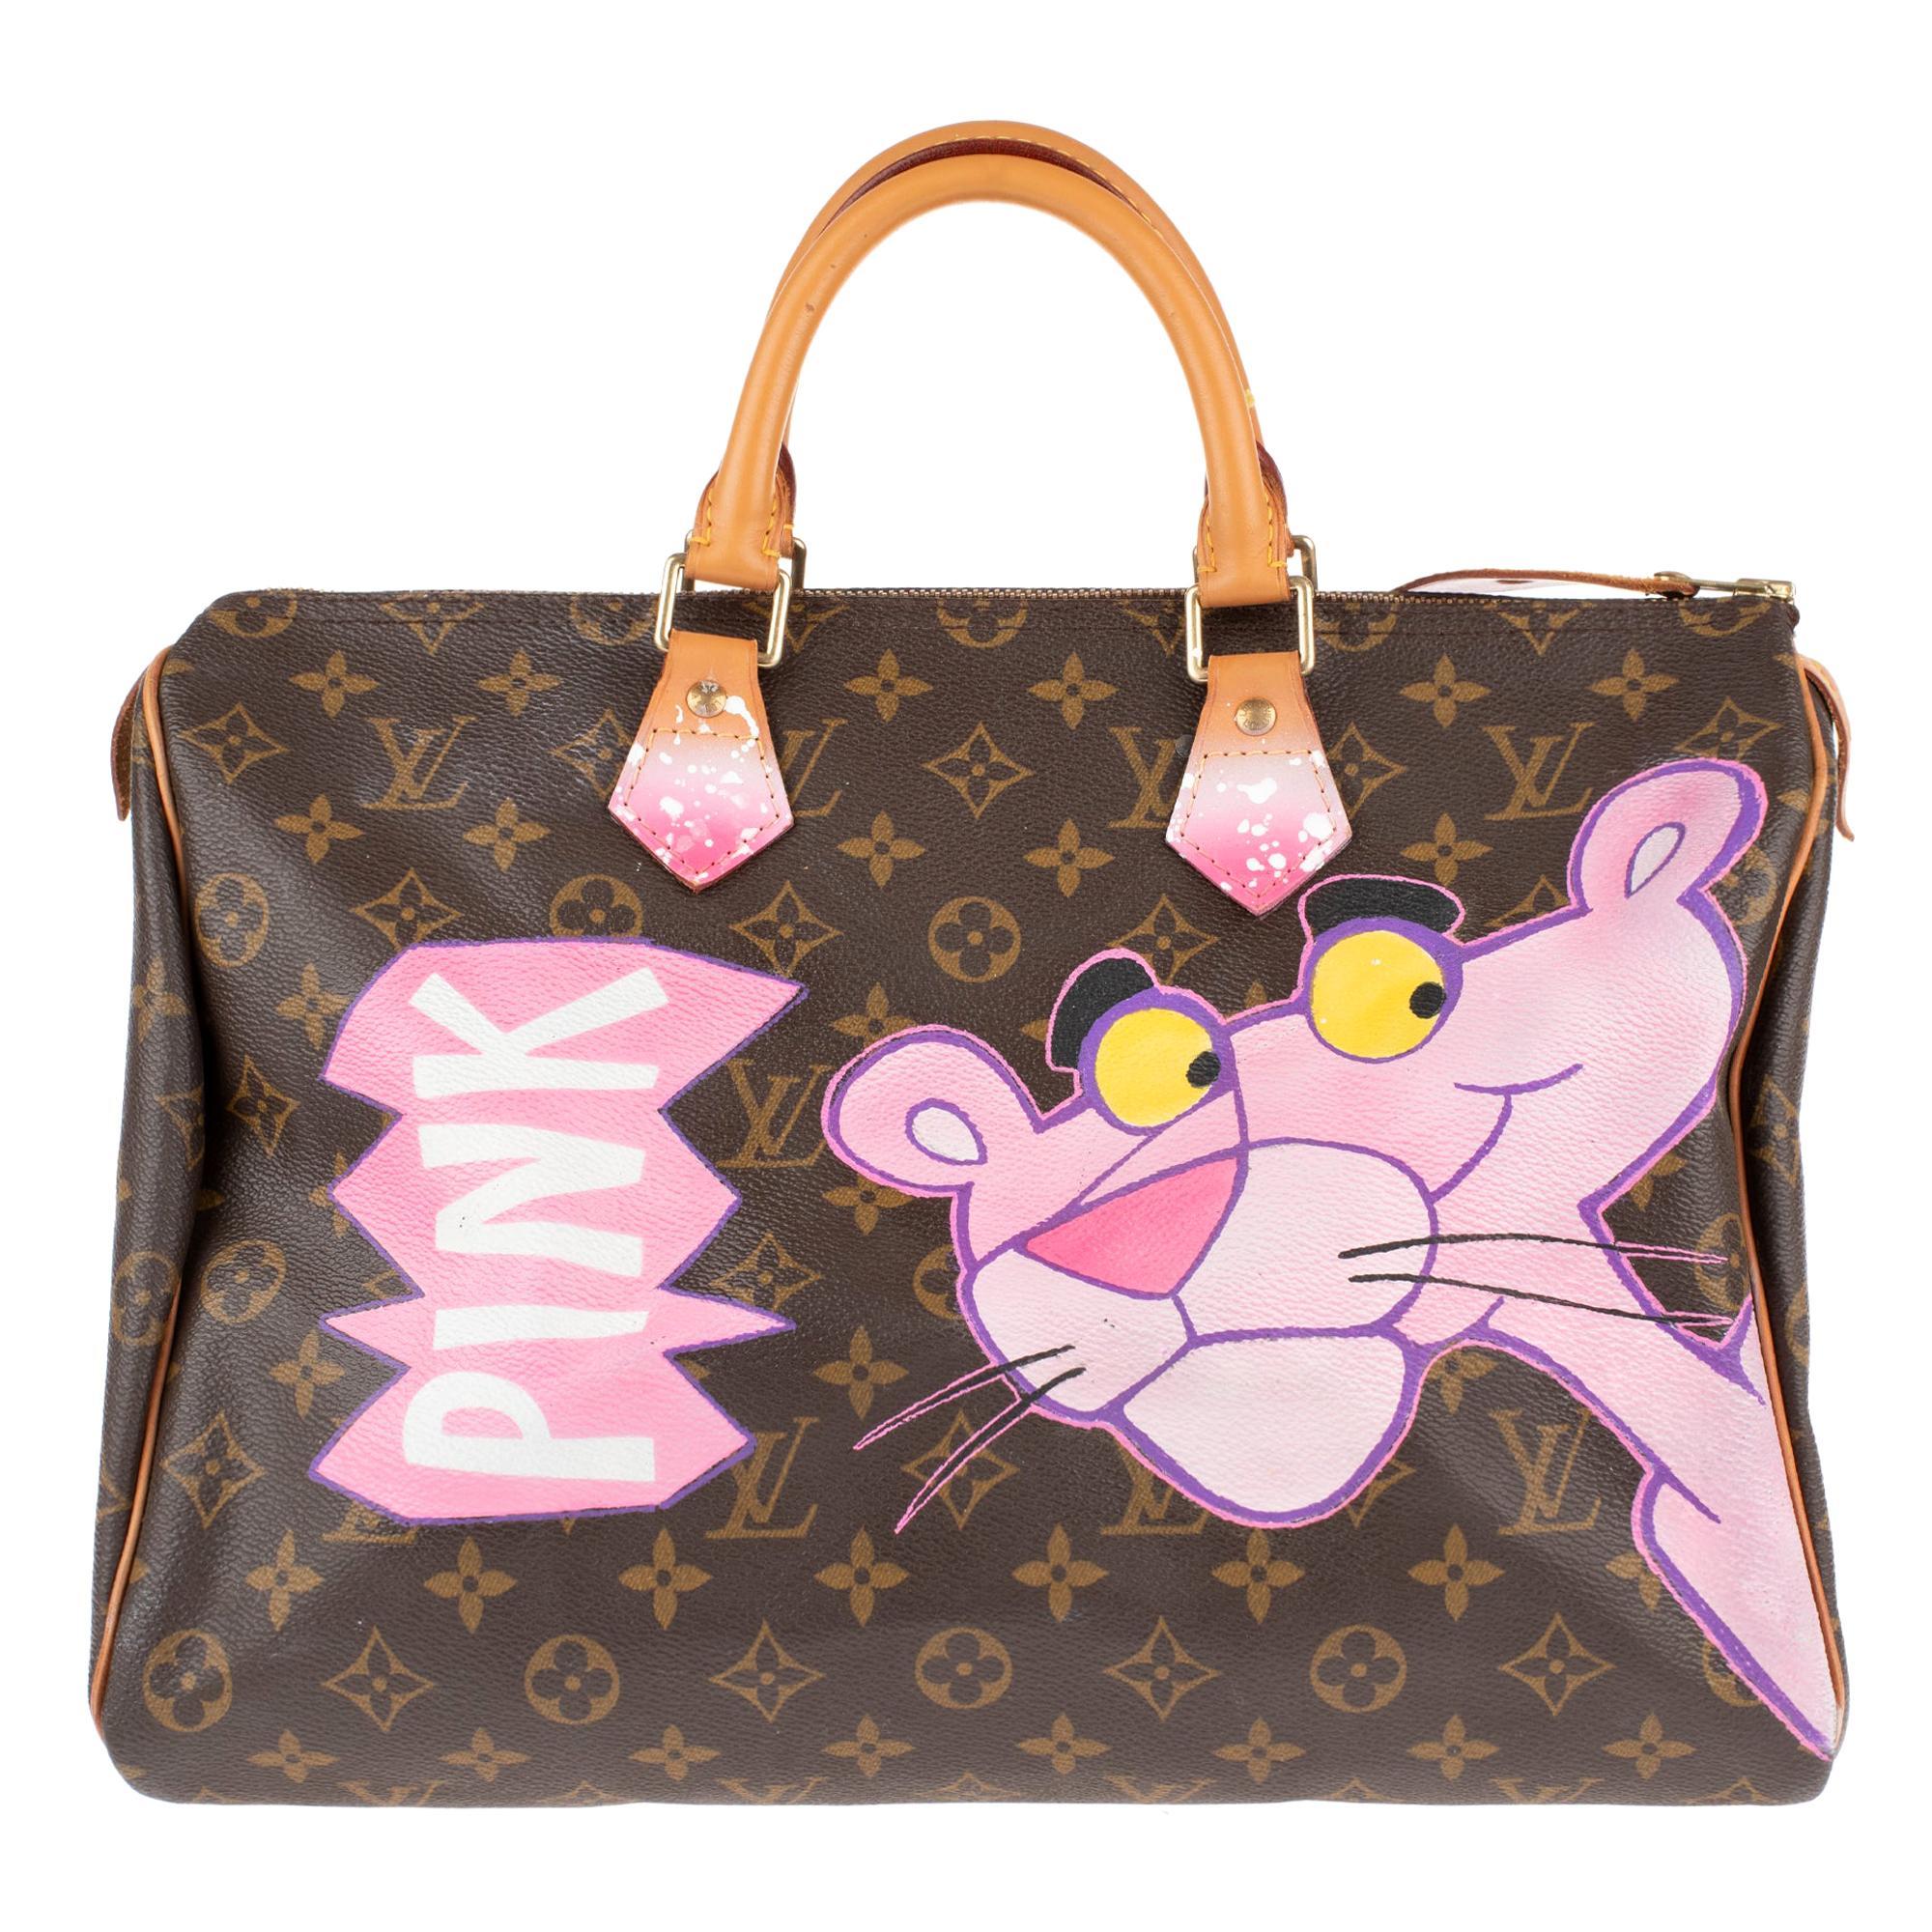 "Handbag Louis Vuitton Speedy 35 Monogram customized ""Pink Panther I"" by PatBo !"